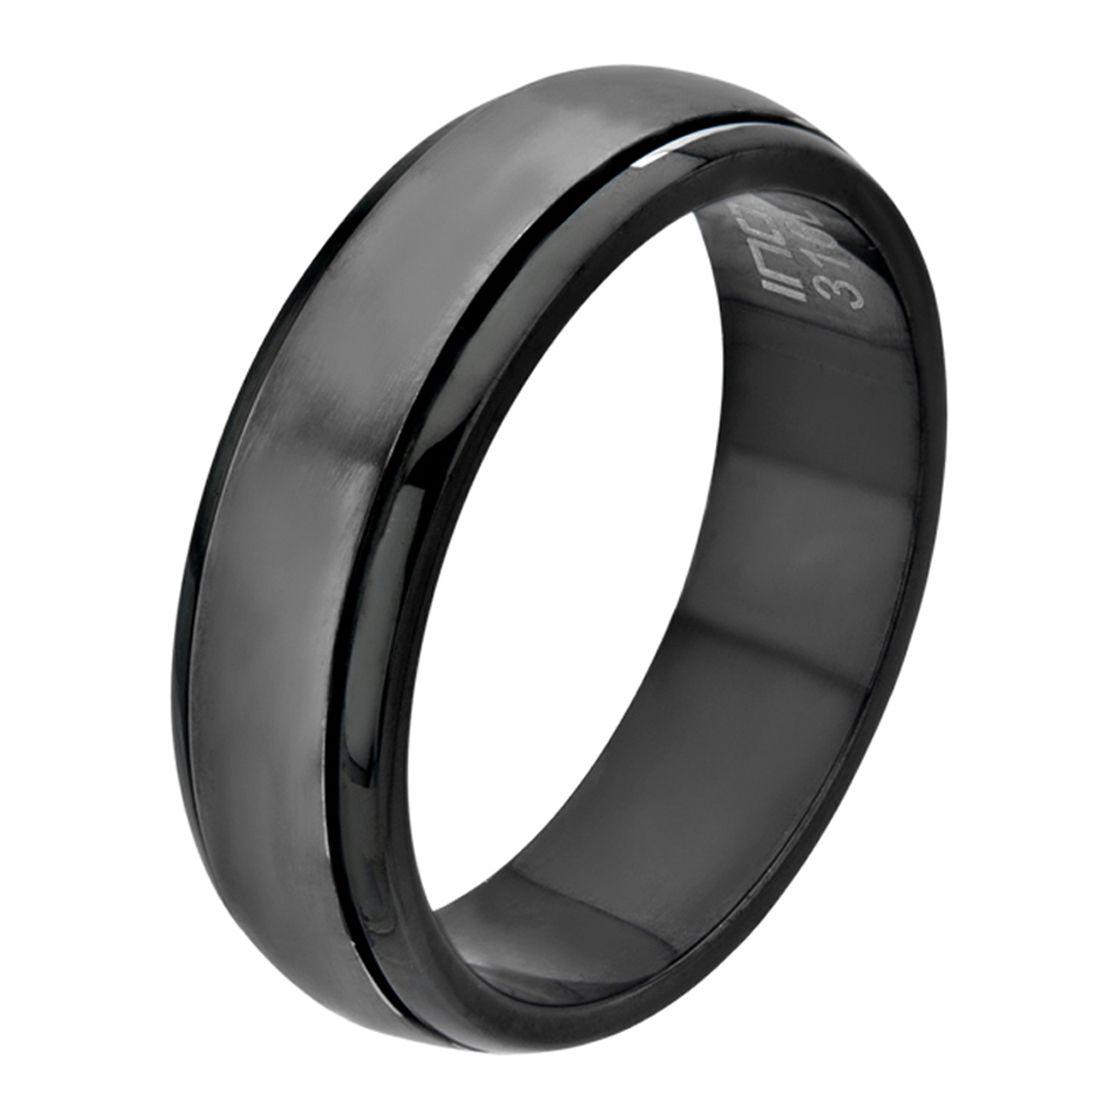 Inox Jewelry Black Stainless Steel Classic Spinner Ring